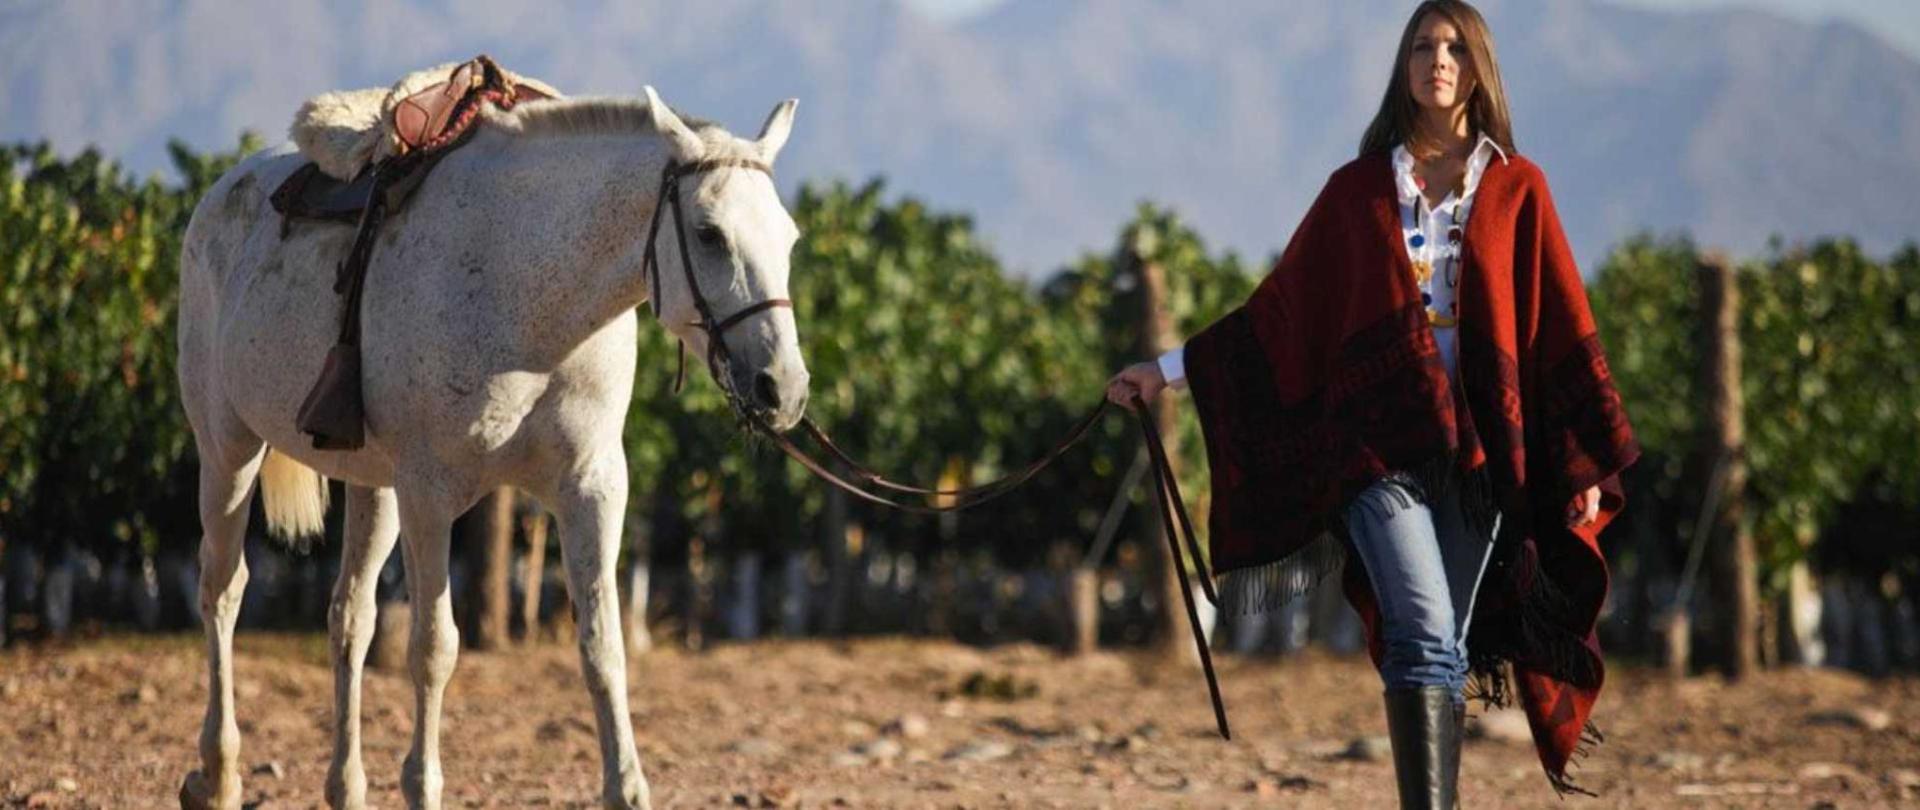 horseride-argentina.jpg